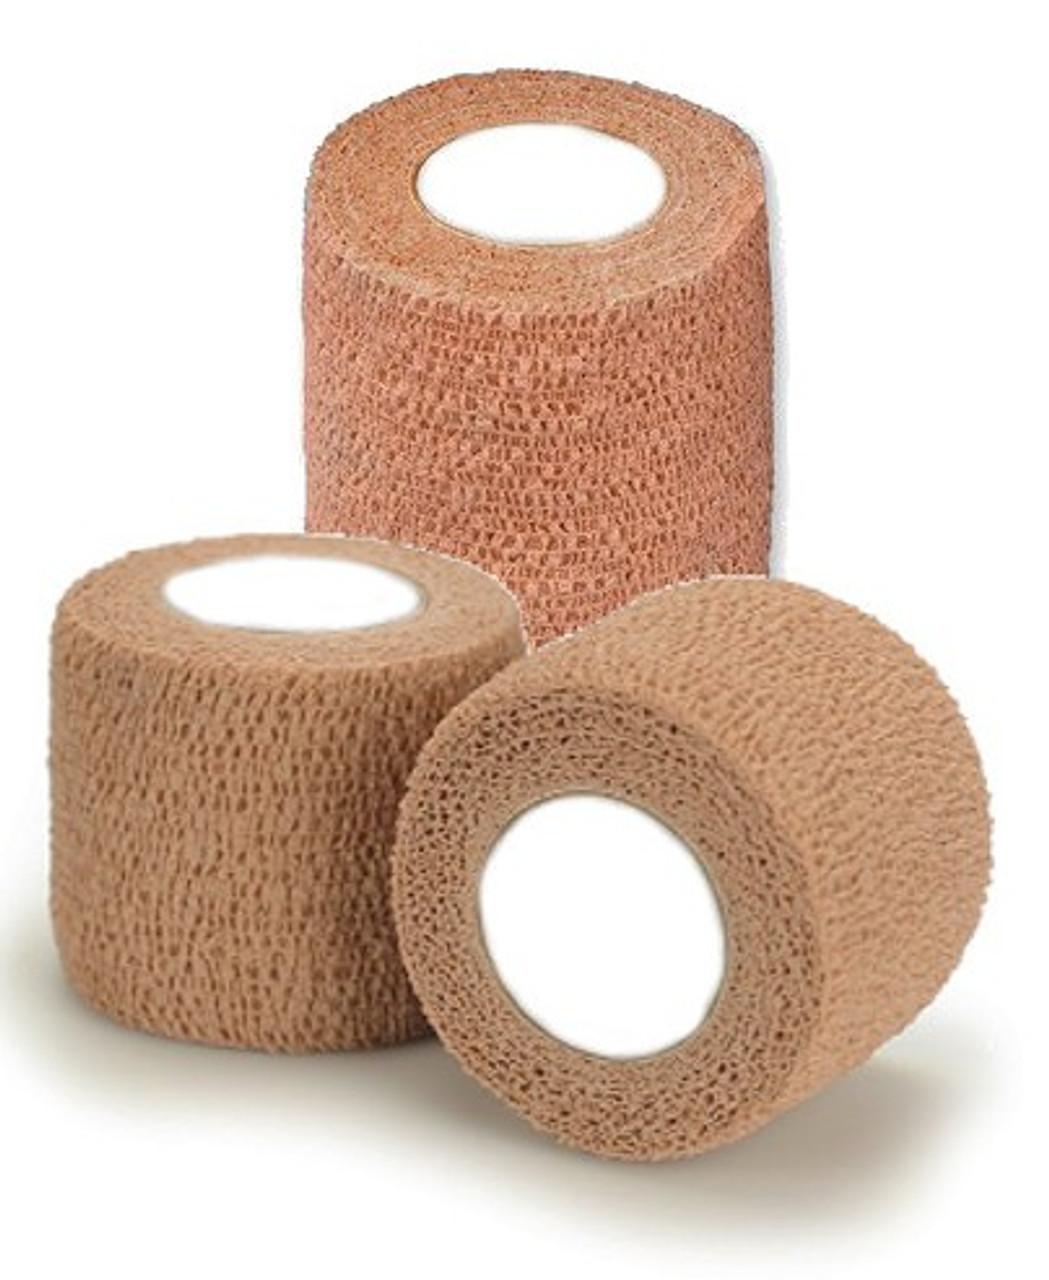 Co Lastic Self Adhering Elastic Bandage Various Sizes Medical